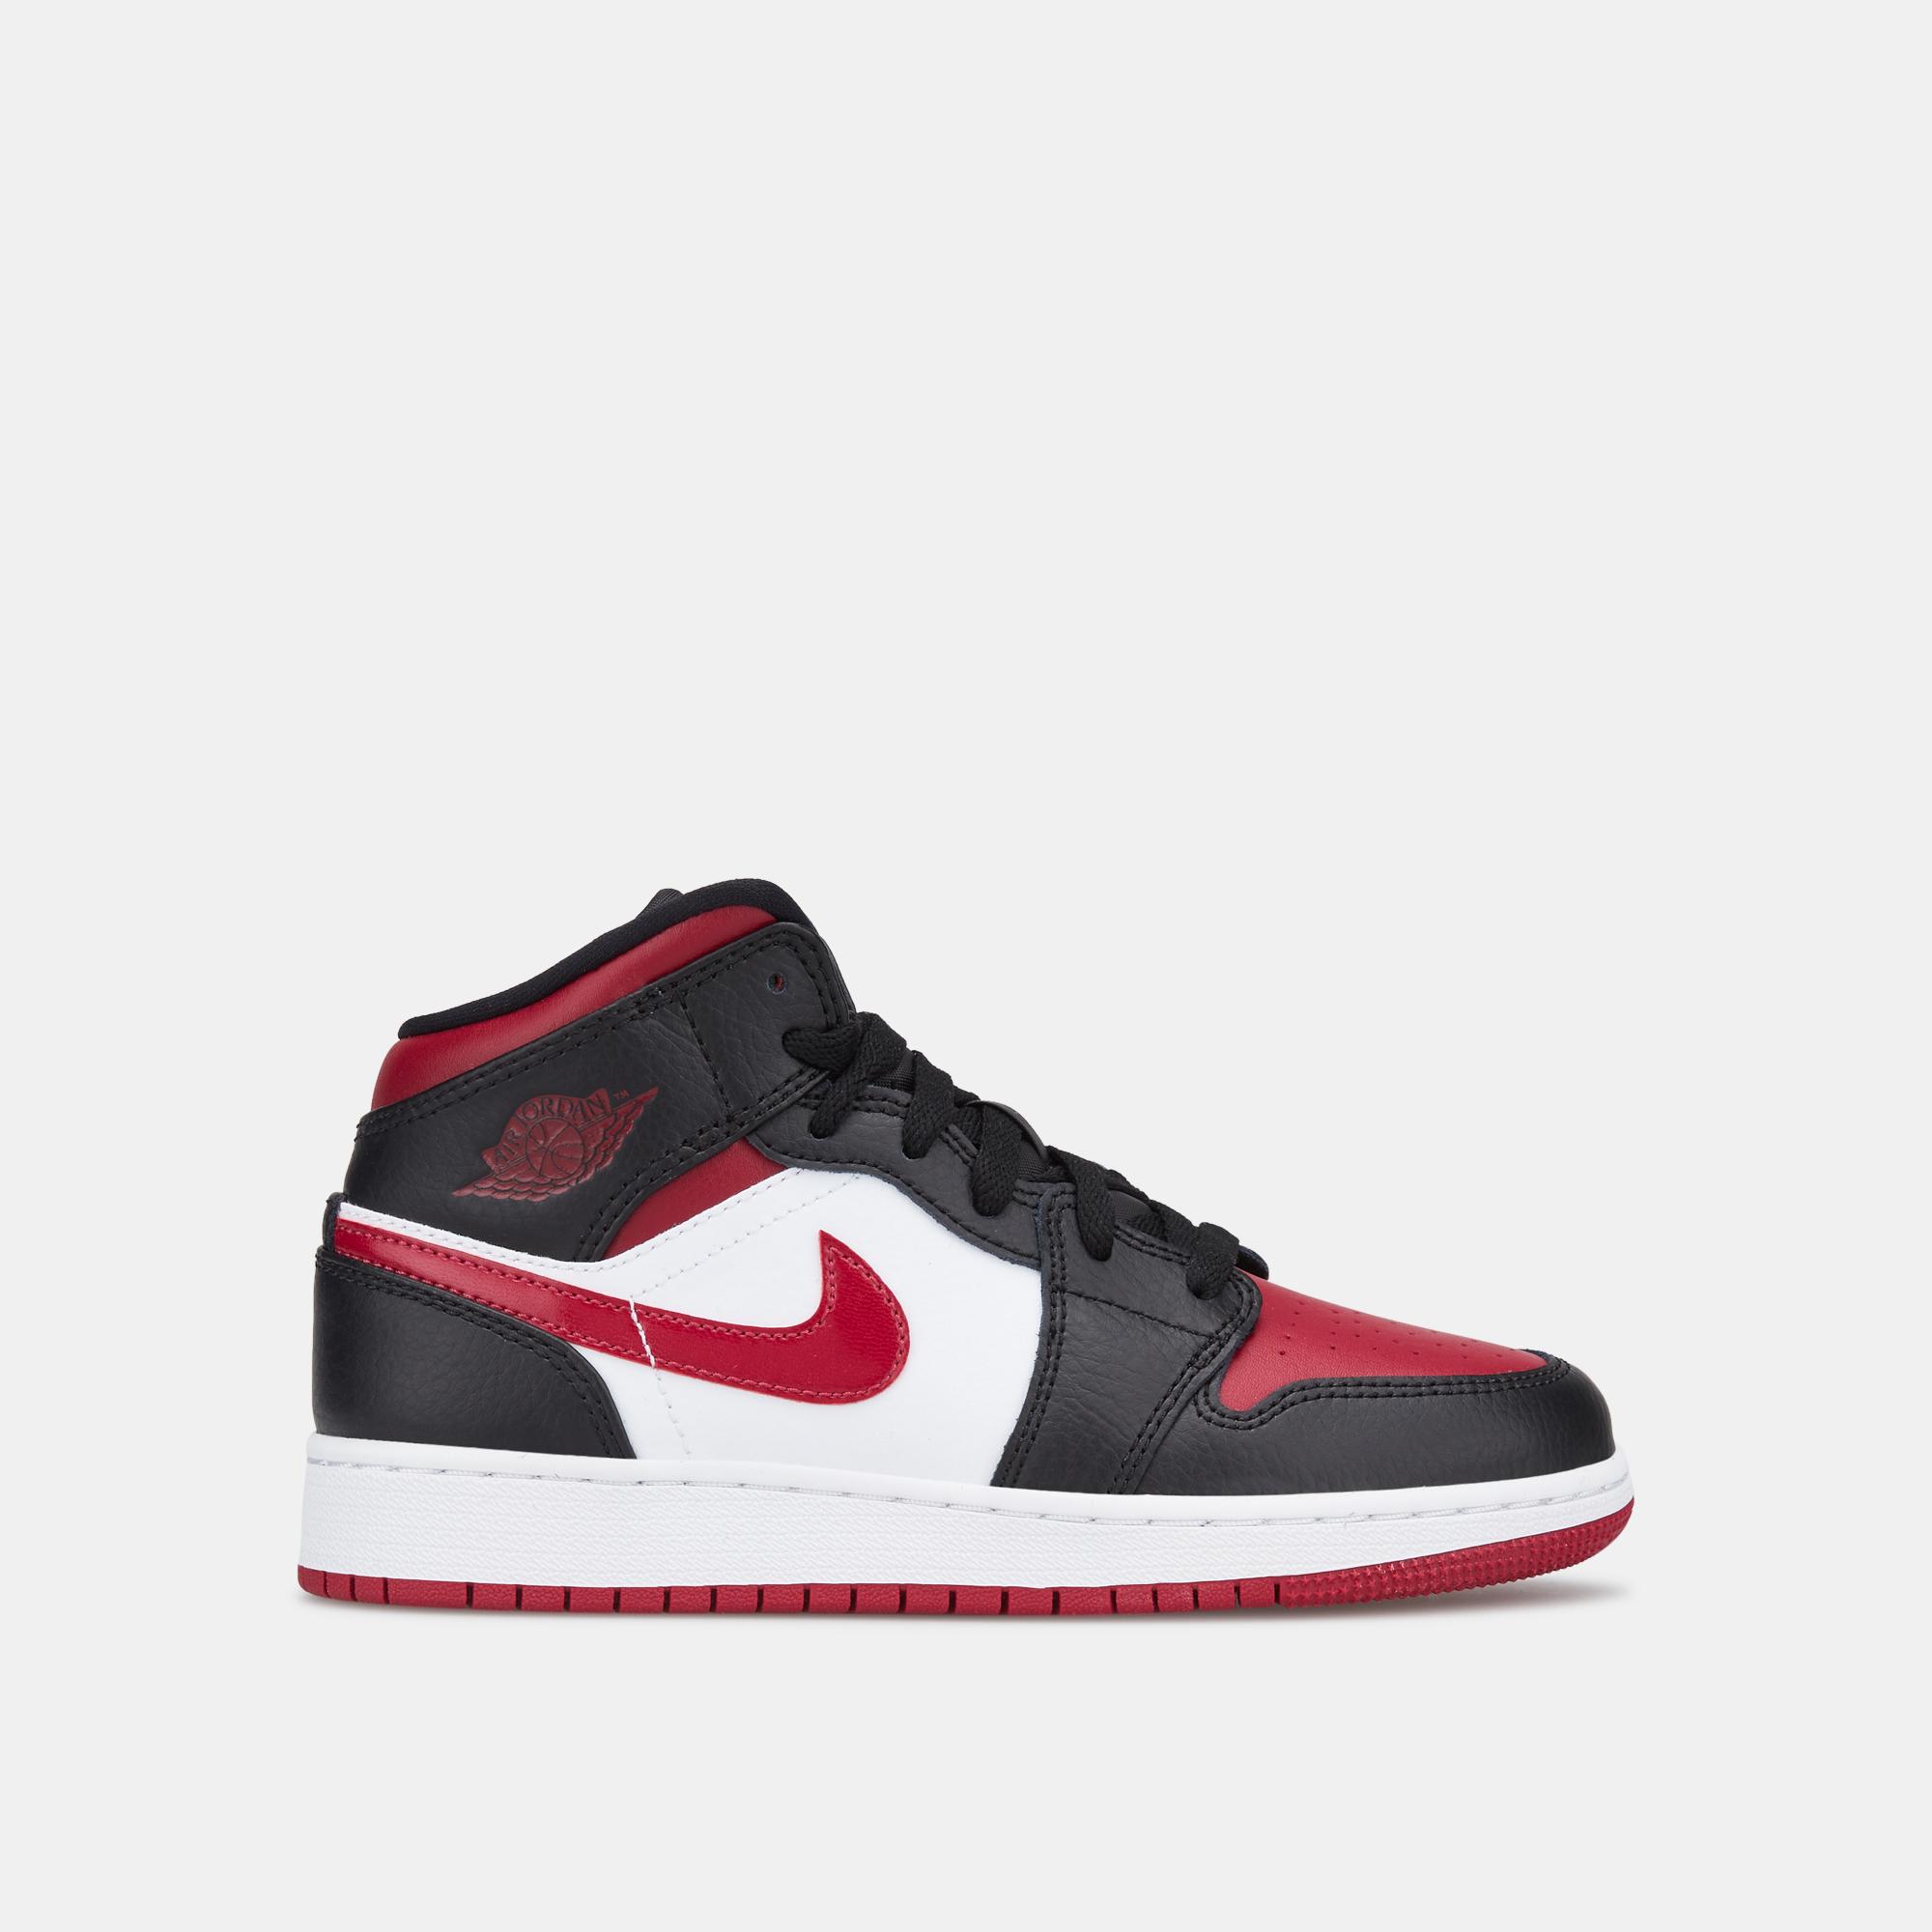 per tutta la famiglia acquista per ufficiale presa all'ingrosso Jordan Kids' Air Jordan 1 Mid Shoe (Older Kids) | Basketball Shoes ...